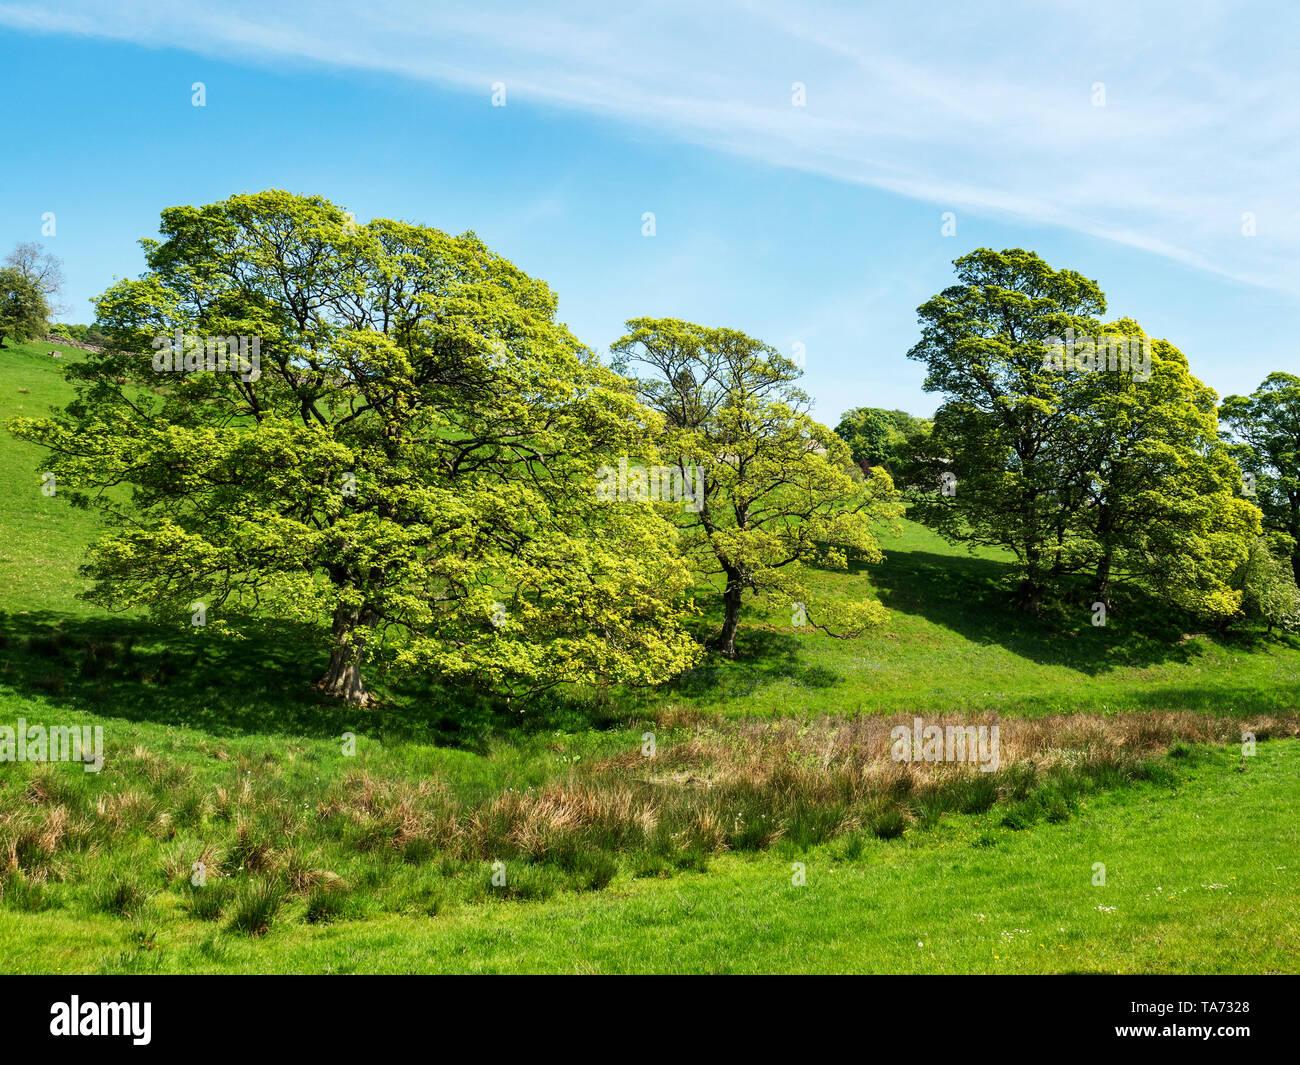 Oak trees in the Nidderdale AONB near Pateley Bridge North Yorkshire England - Stock Image